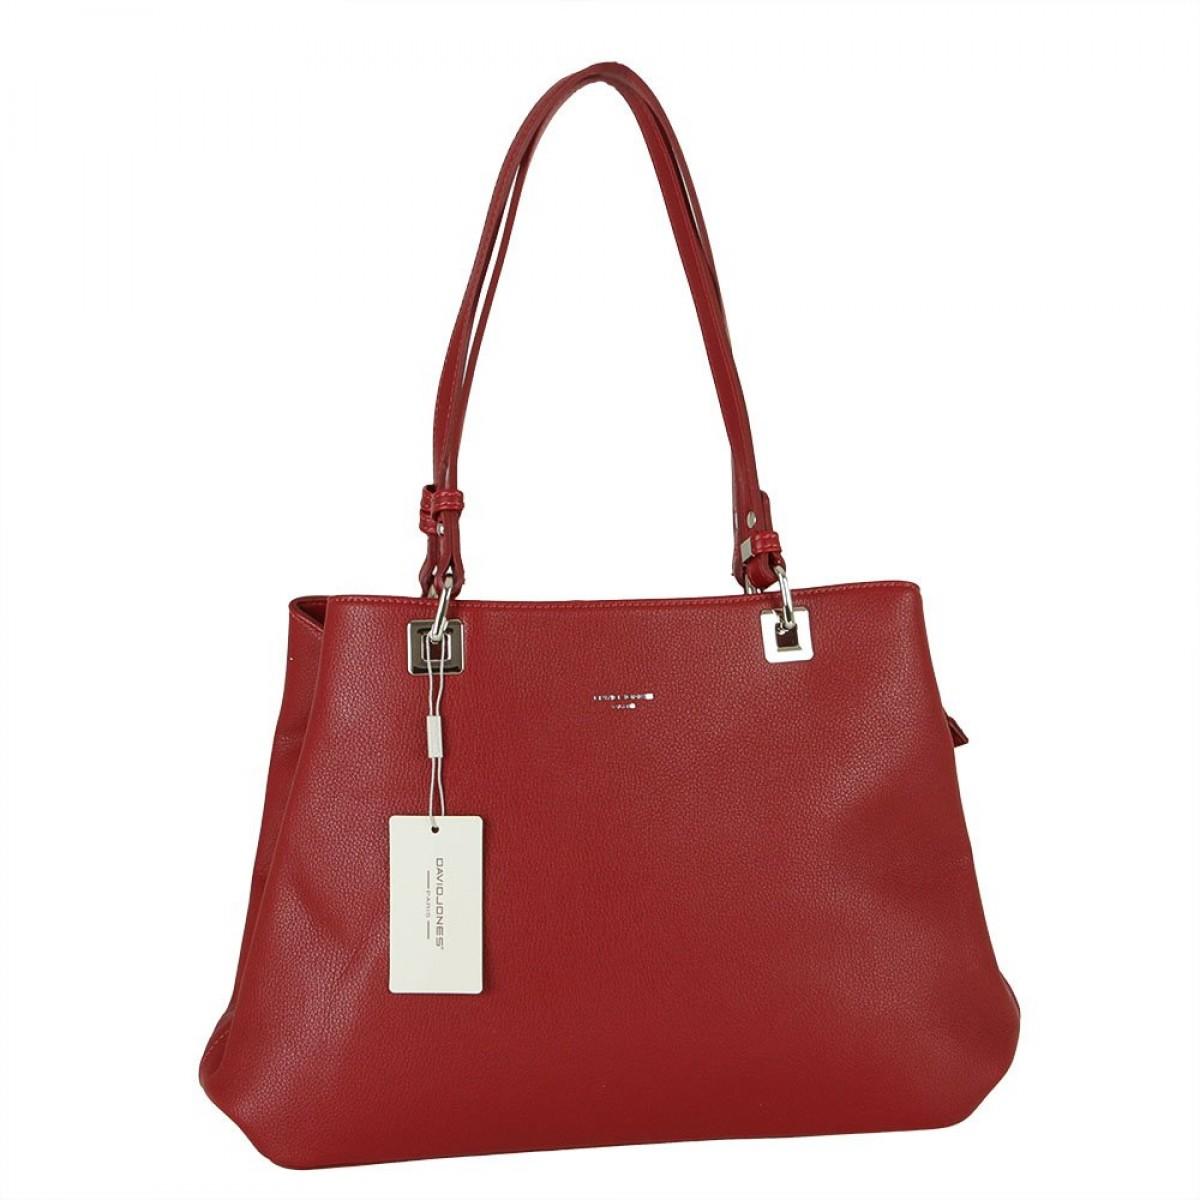 Жіноча сумка David Jones CM5879 DARK RED